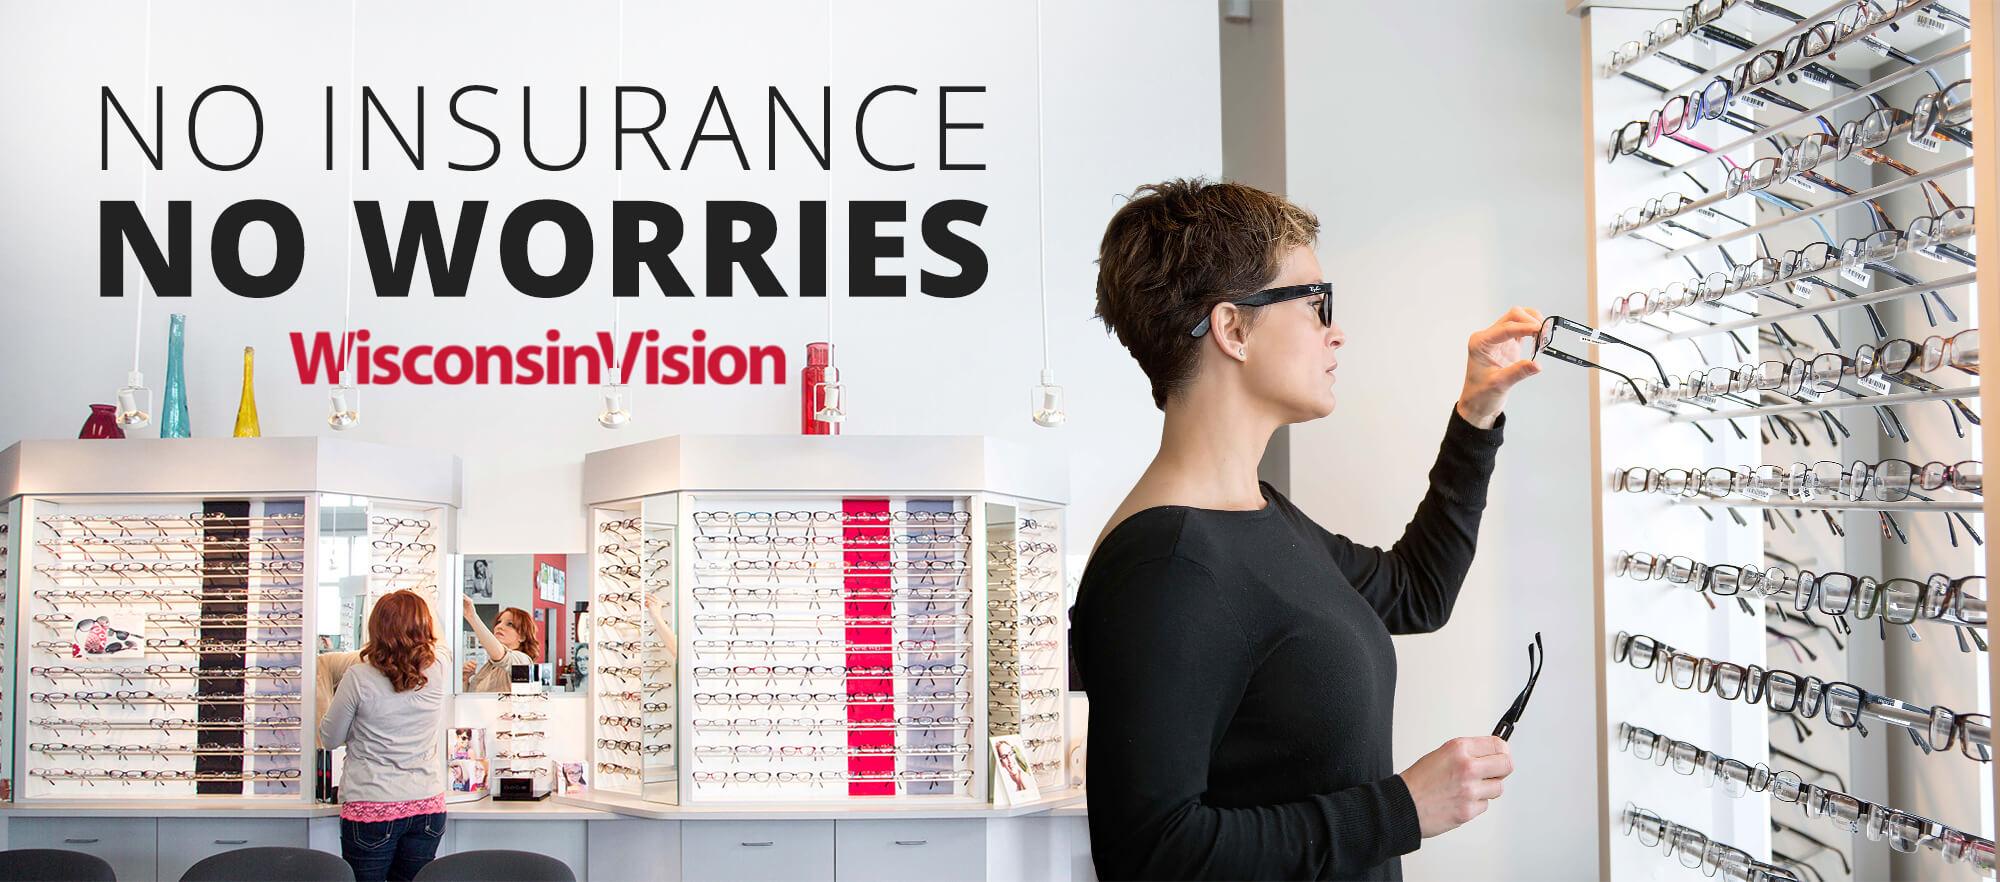 Kenosha store takes insurance: glasses, eye doctor exams